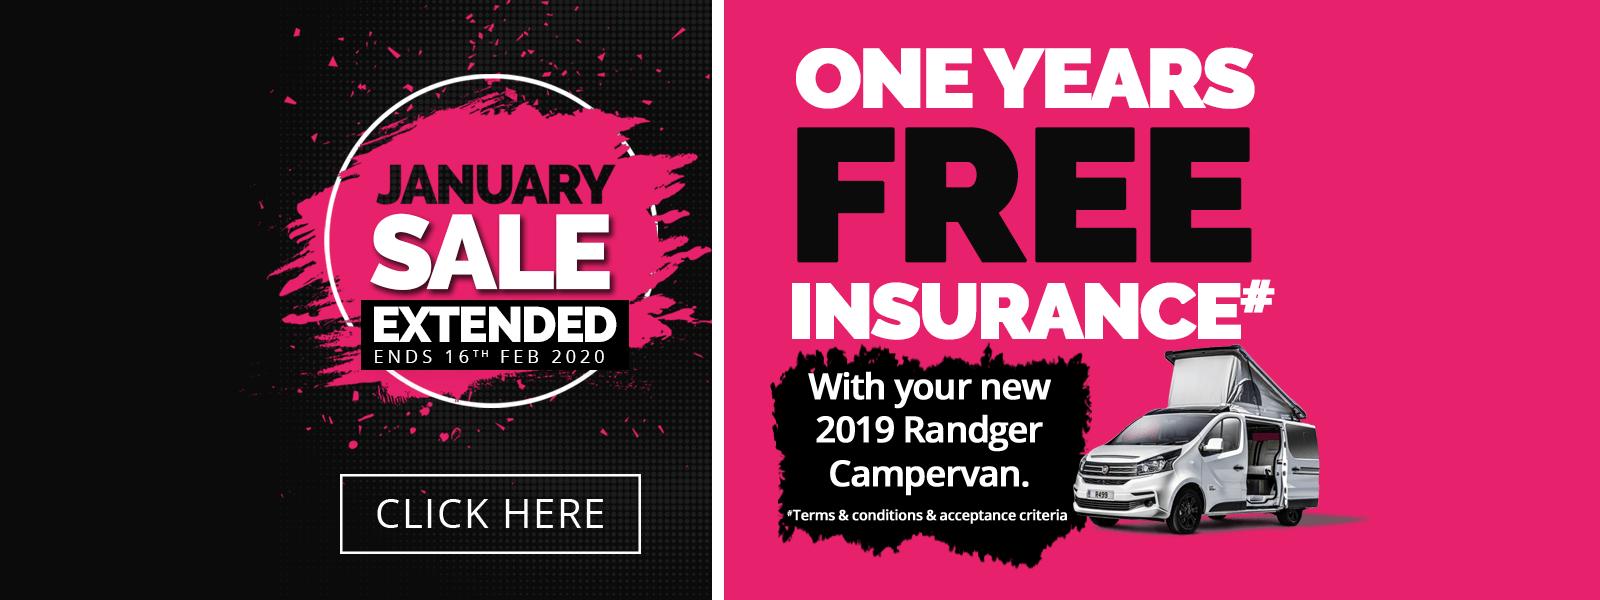 Randger Free Insurance